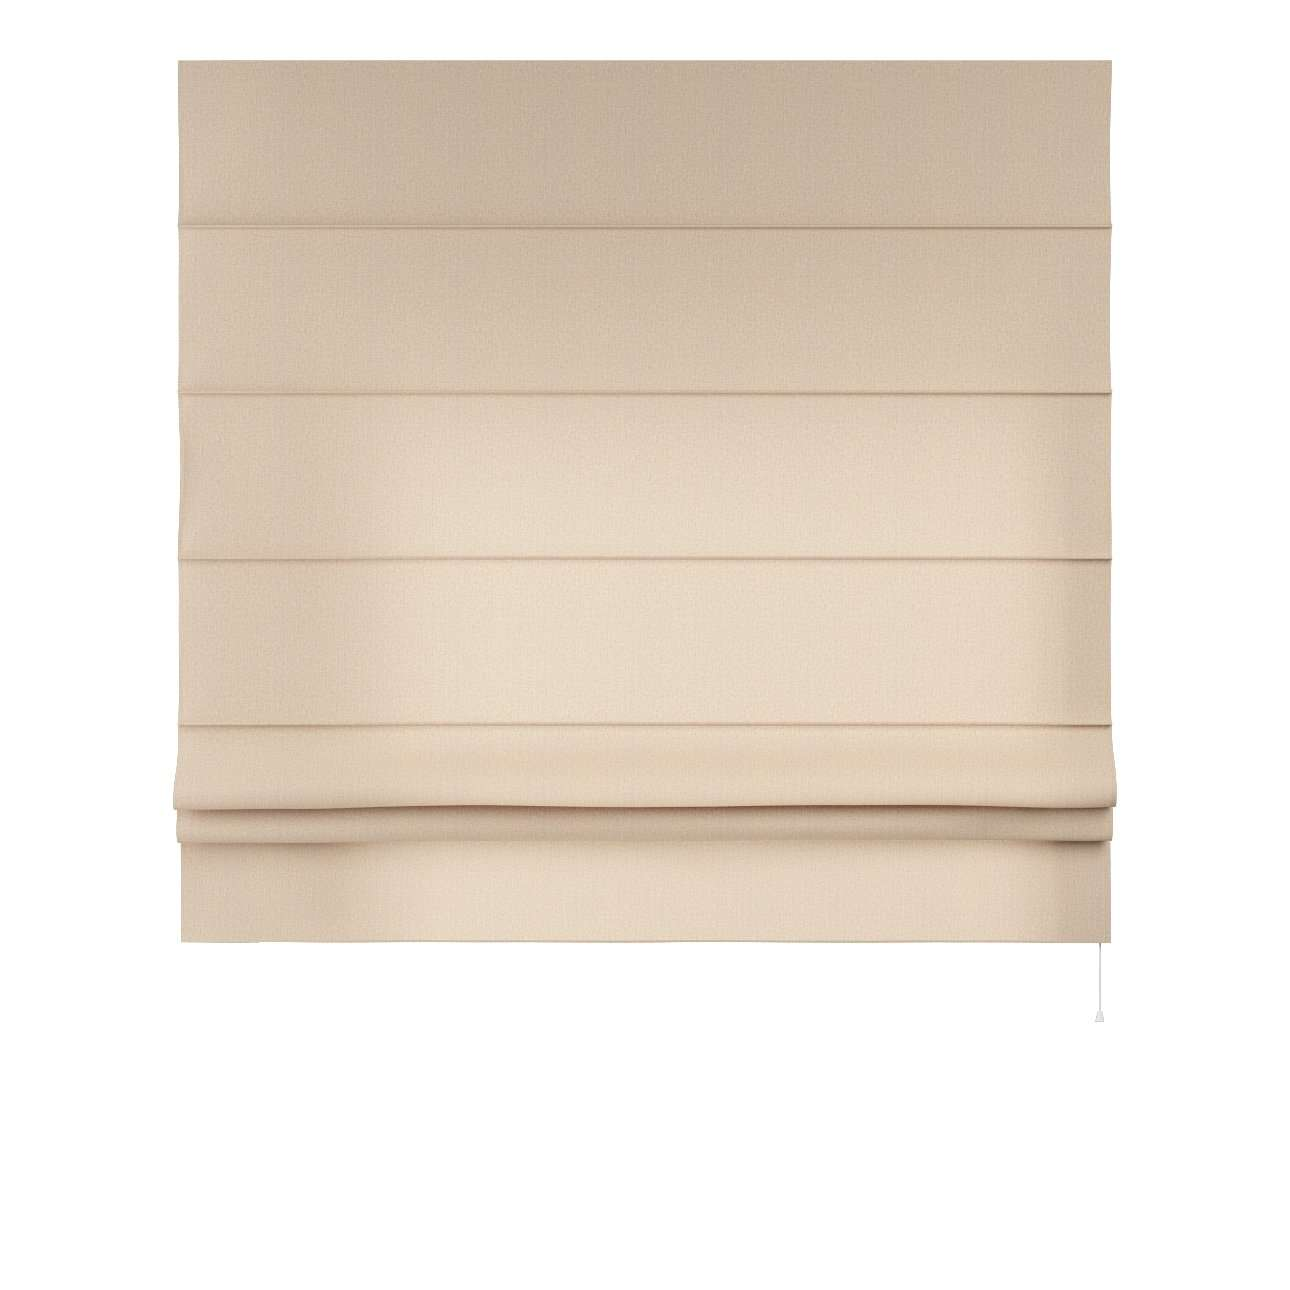 Padva roman blind  80 x 170 cm (31.5 x 67 inch) in collection Edinburgh, fabric: 115-78